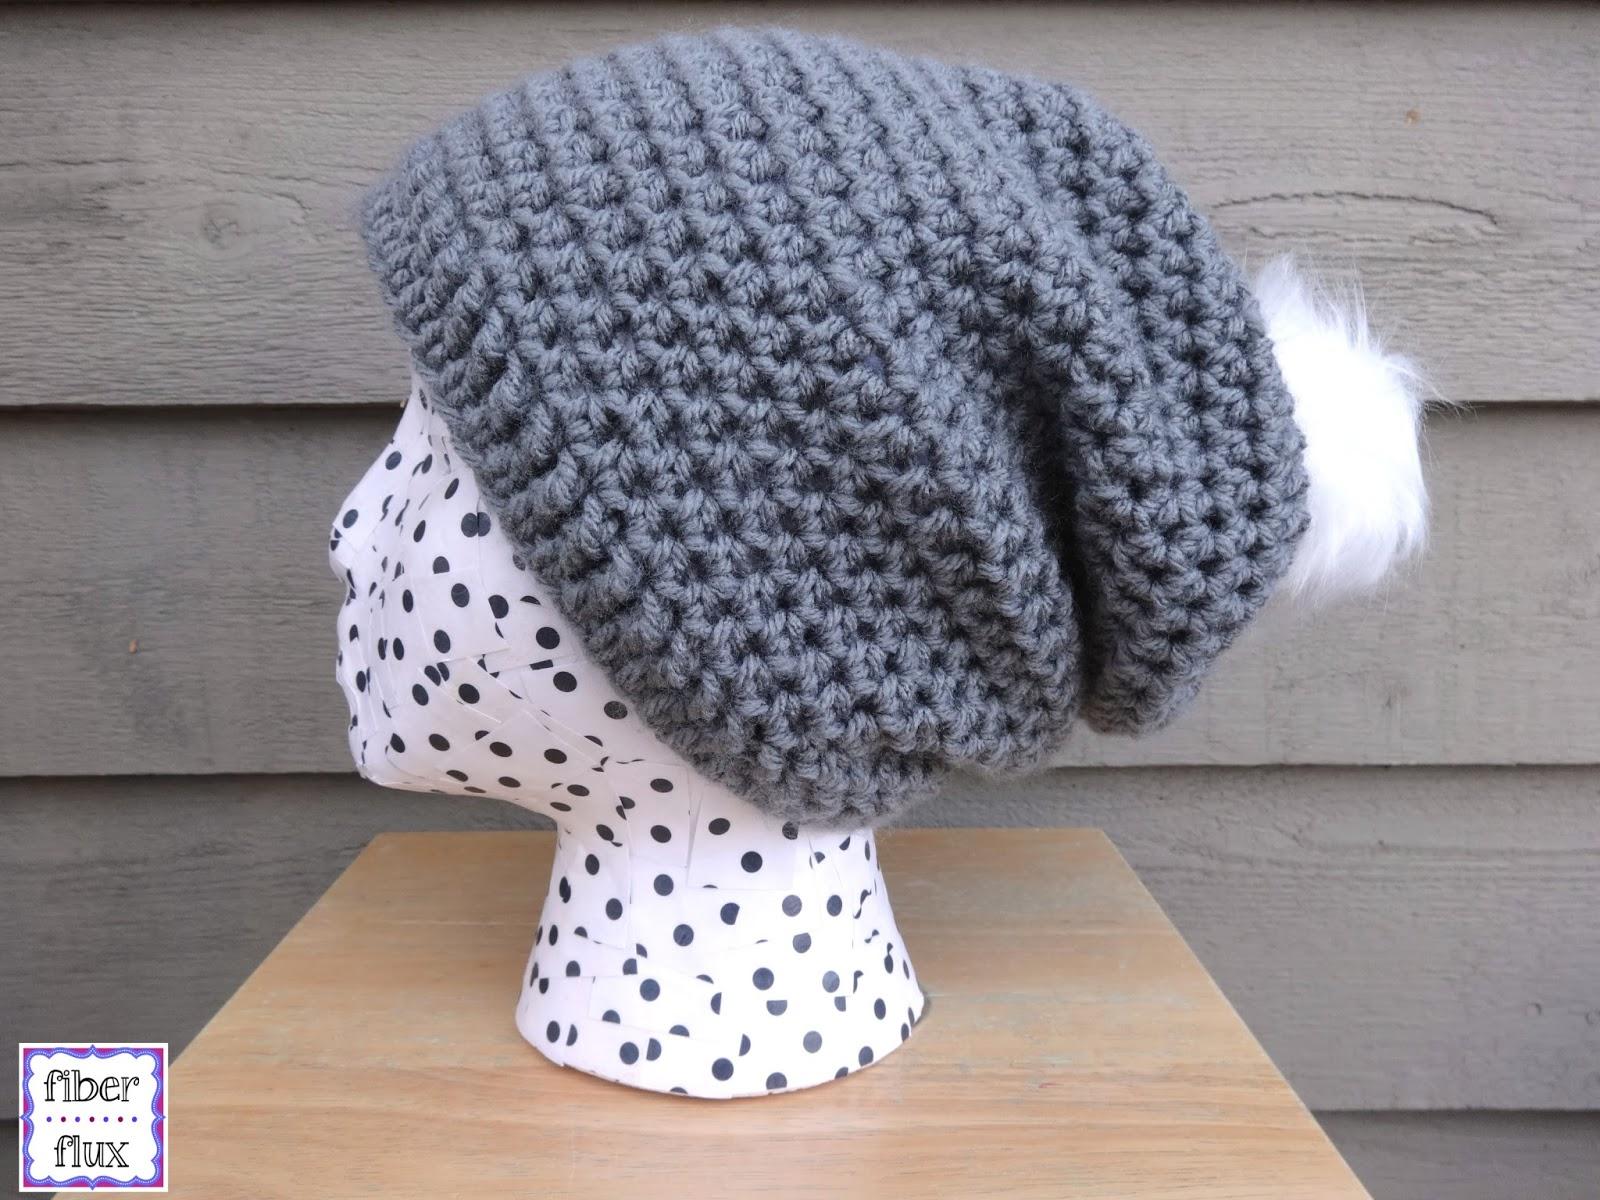 Fiber Flux Free Crochet Patternttontail Slouch